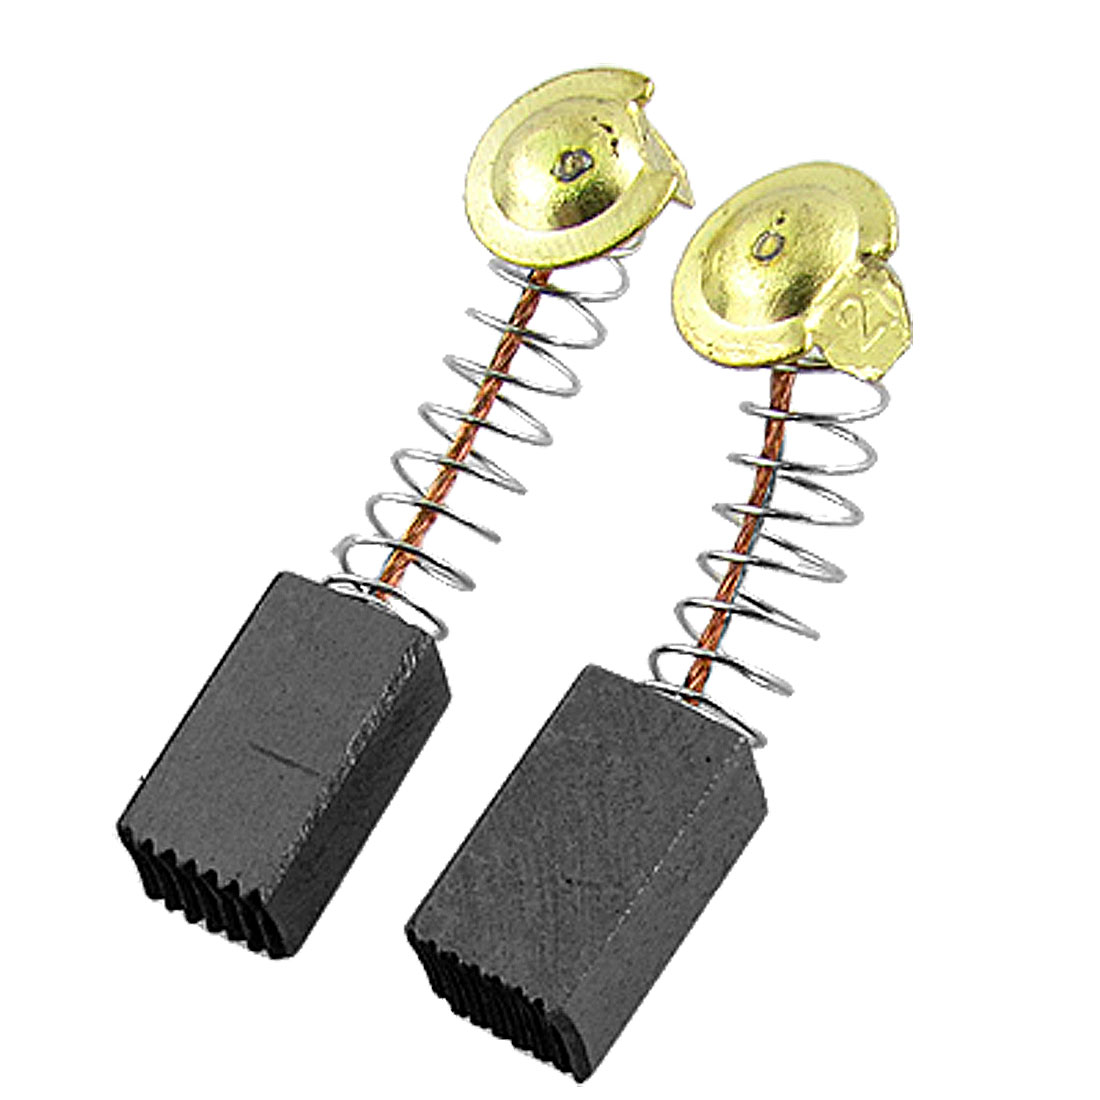 "20 Pcs 33/64"" x 19/64"" x 1/4"" Power Tools Part Carbon Brushes 999021"